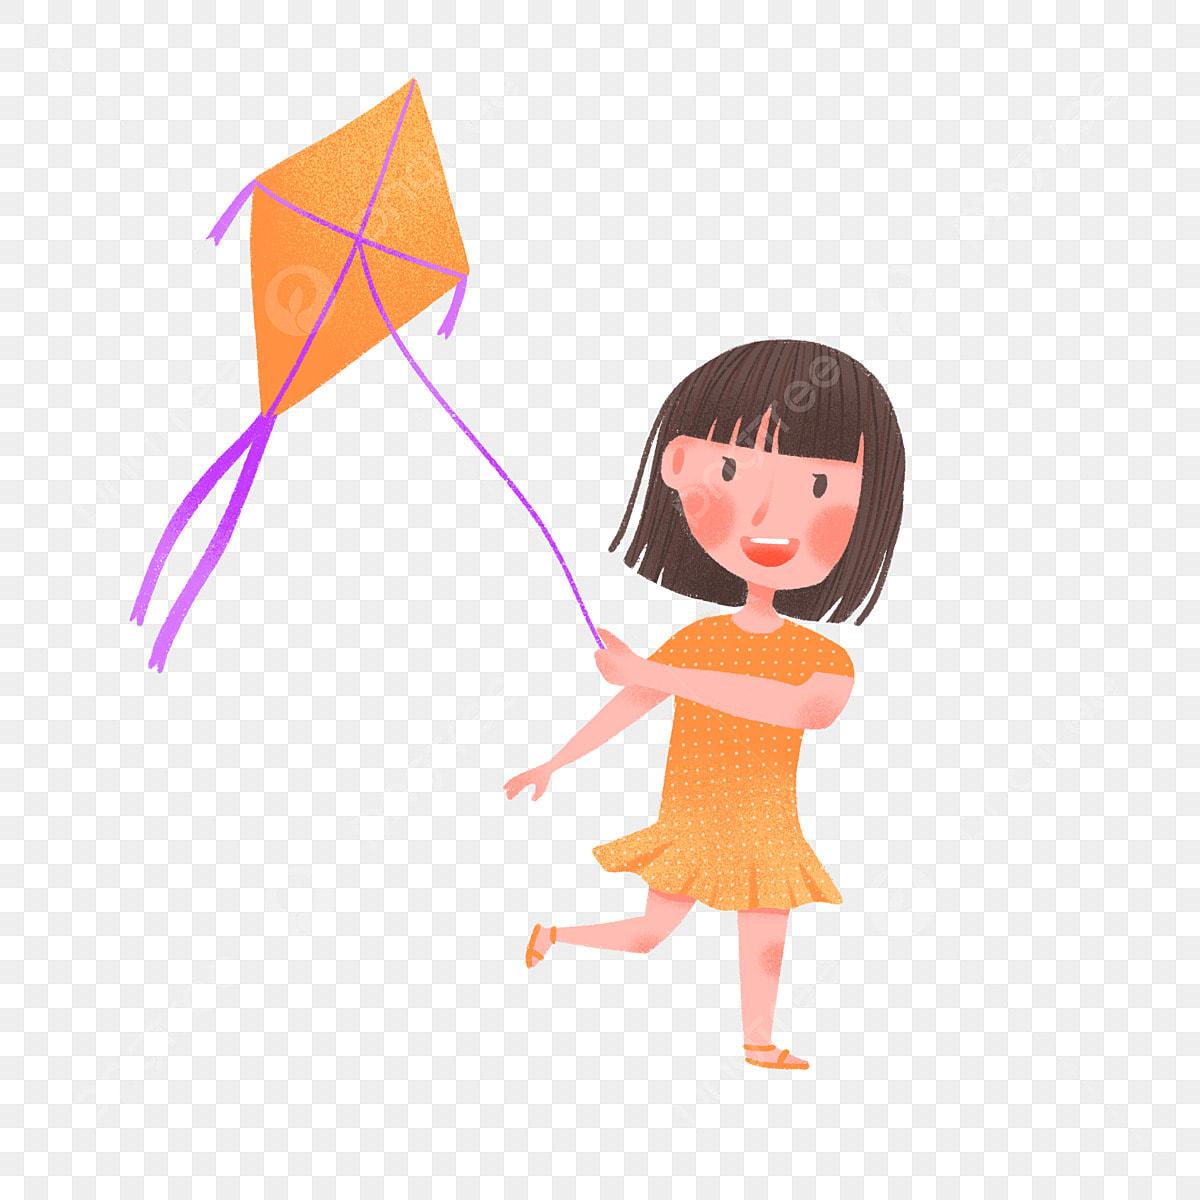 Hand Drawn Cute Girl Flying Kite Kite Cartoon Children Png